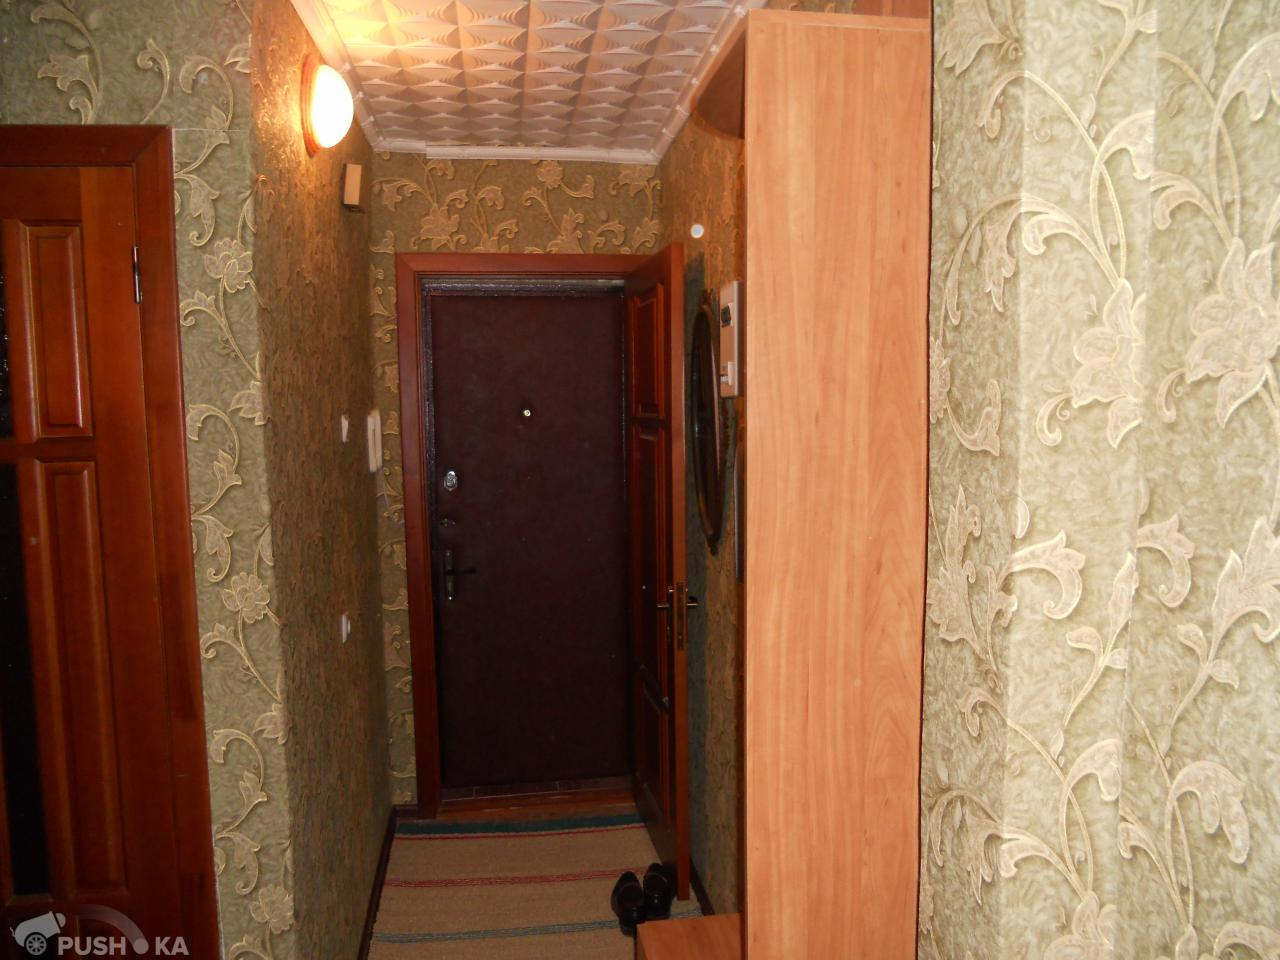 Продаётся 3-комнатная квартира 58.6 кв.м. этаж 2/5 за 1 750 000 руб